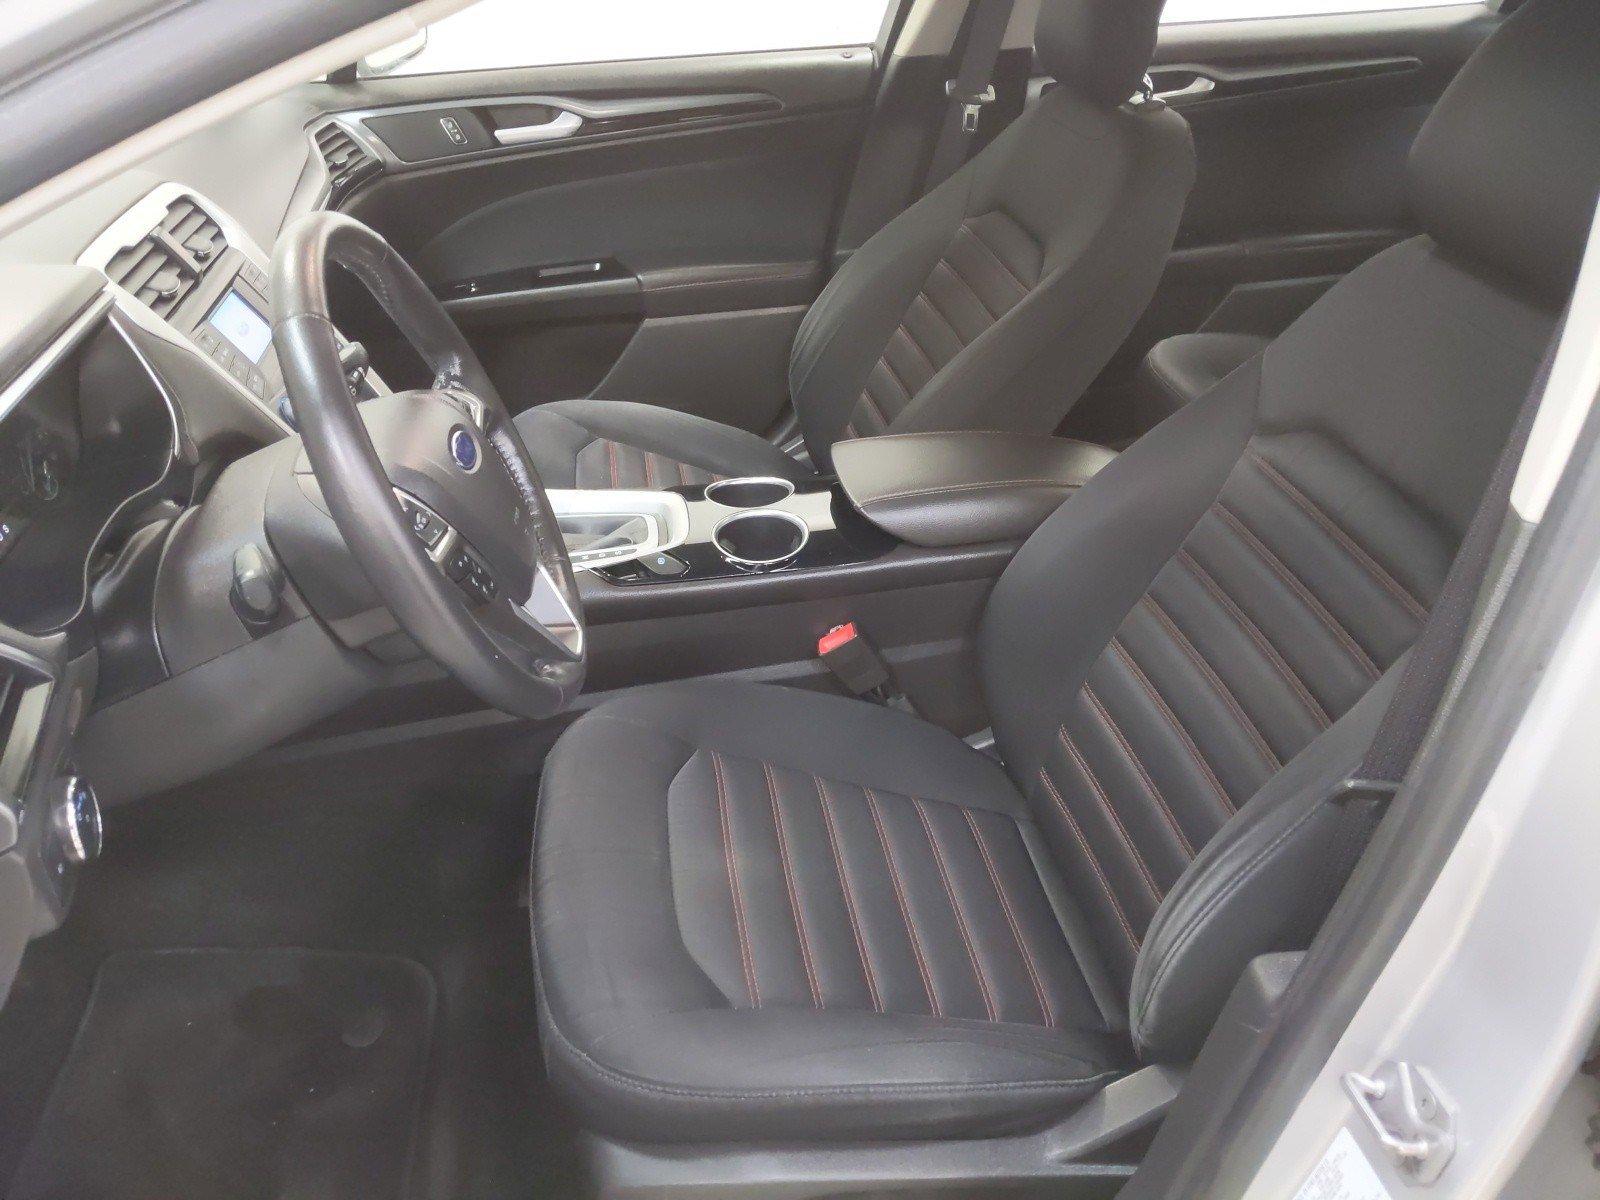 Used 2014 Ford Fusion SE 4D Sedan for sale in Grand Island NE